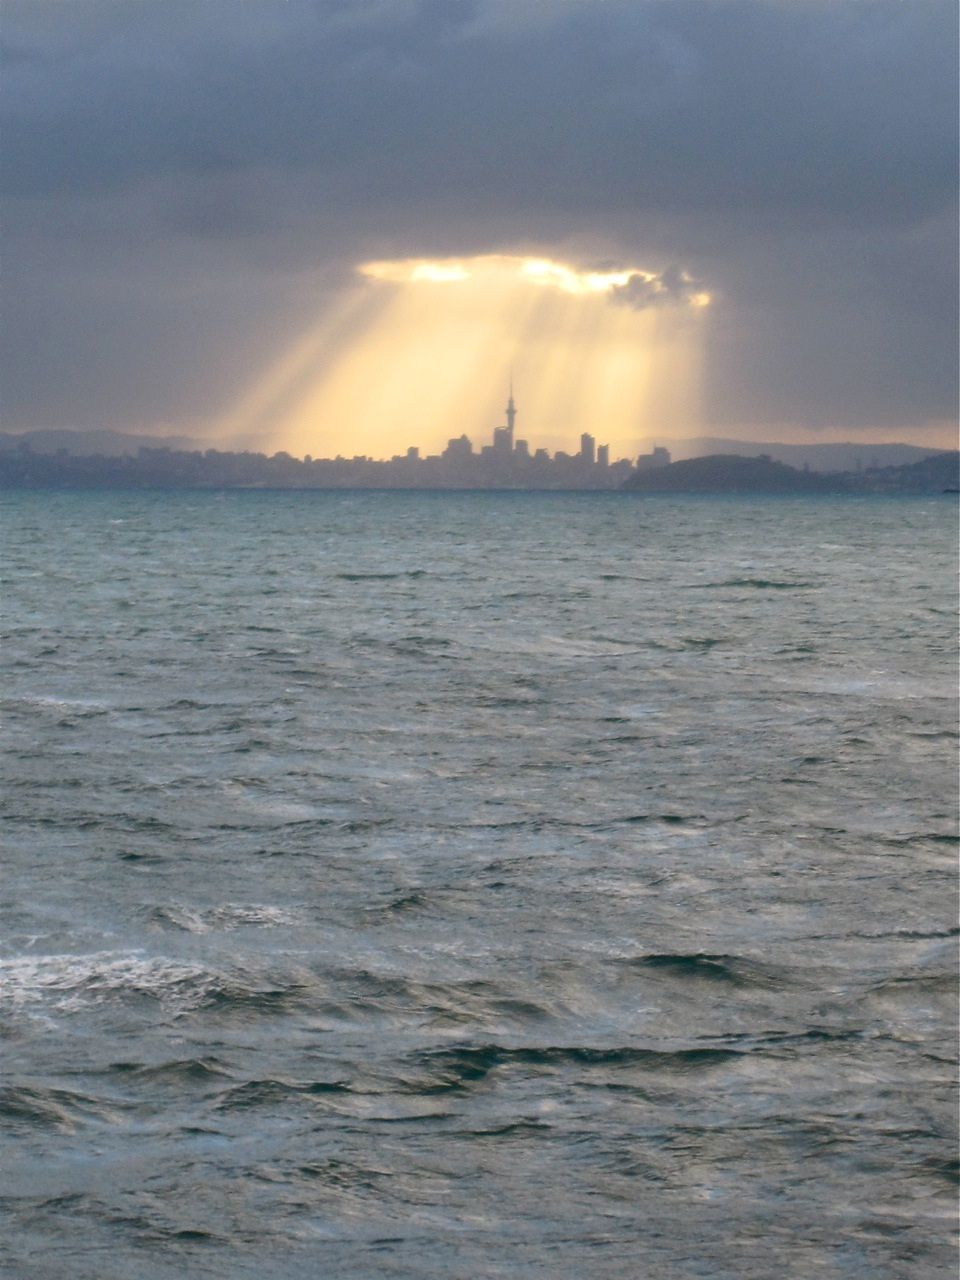 Amazing shot! Auckland, The North Island, New Zealand